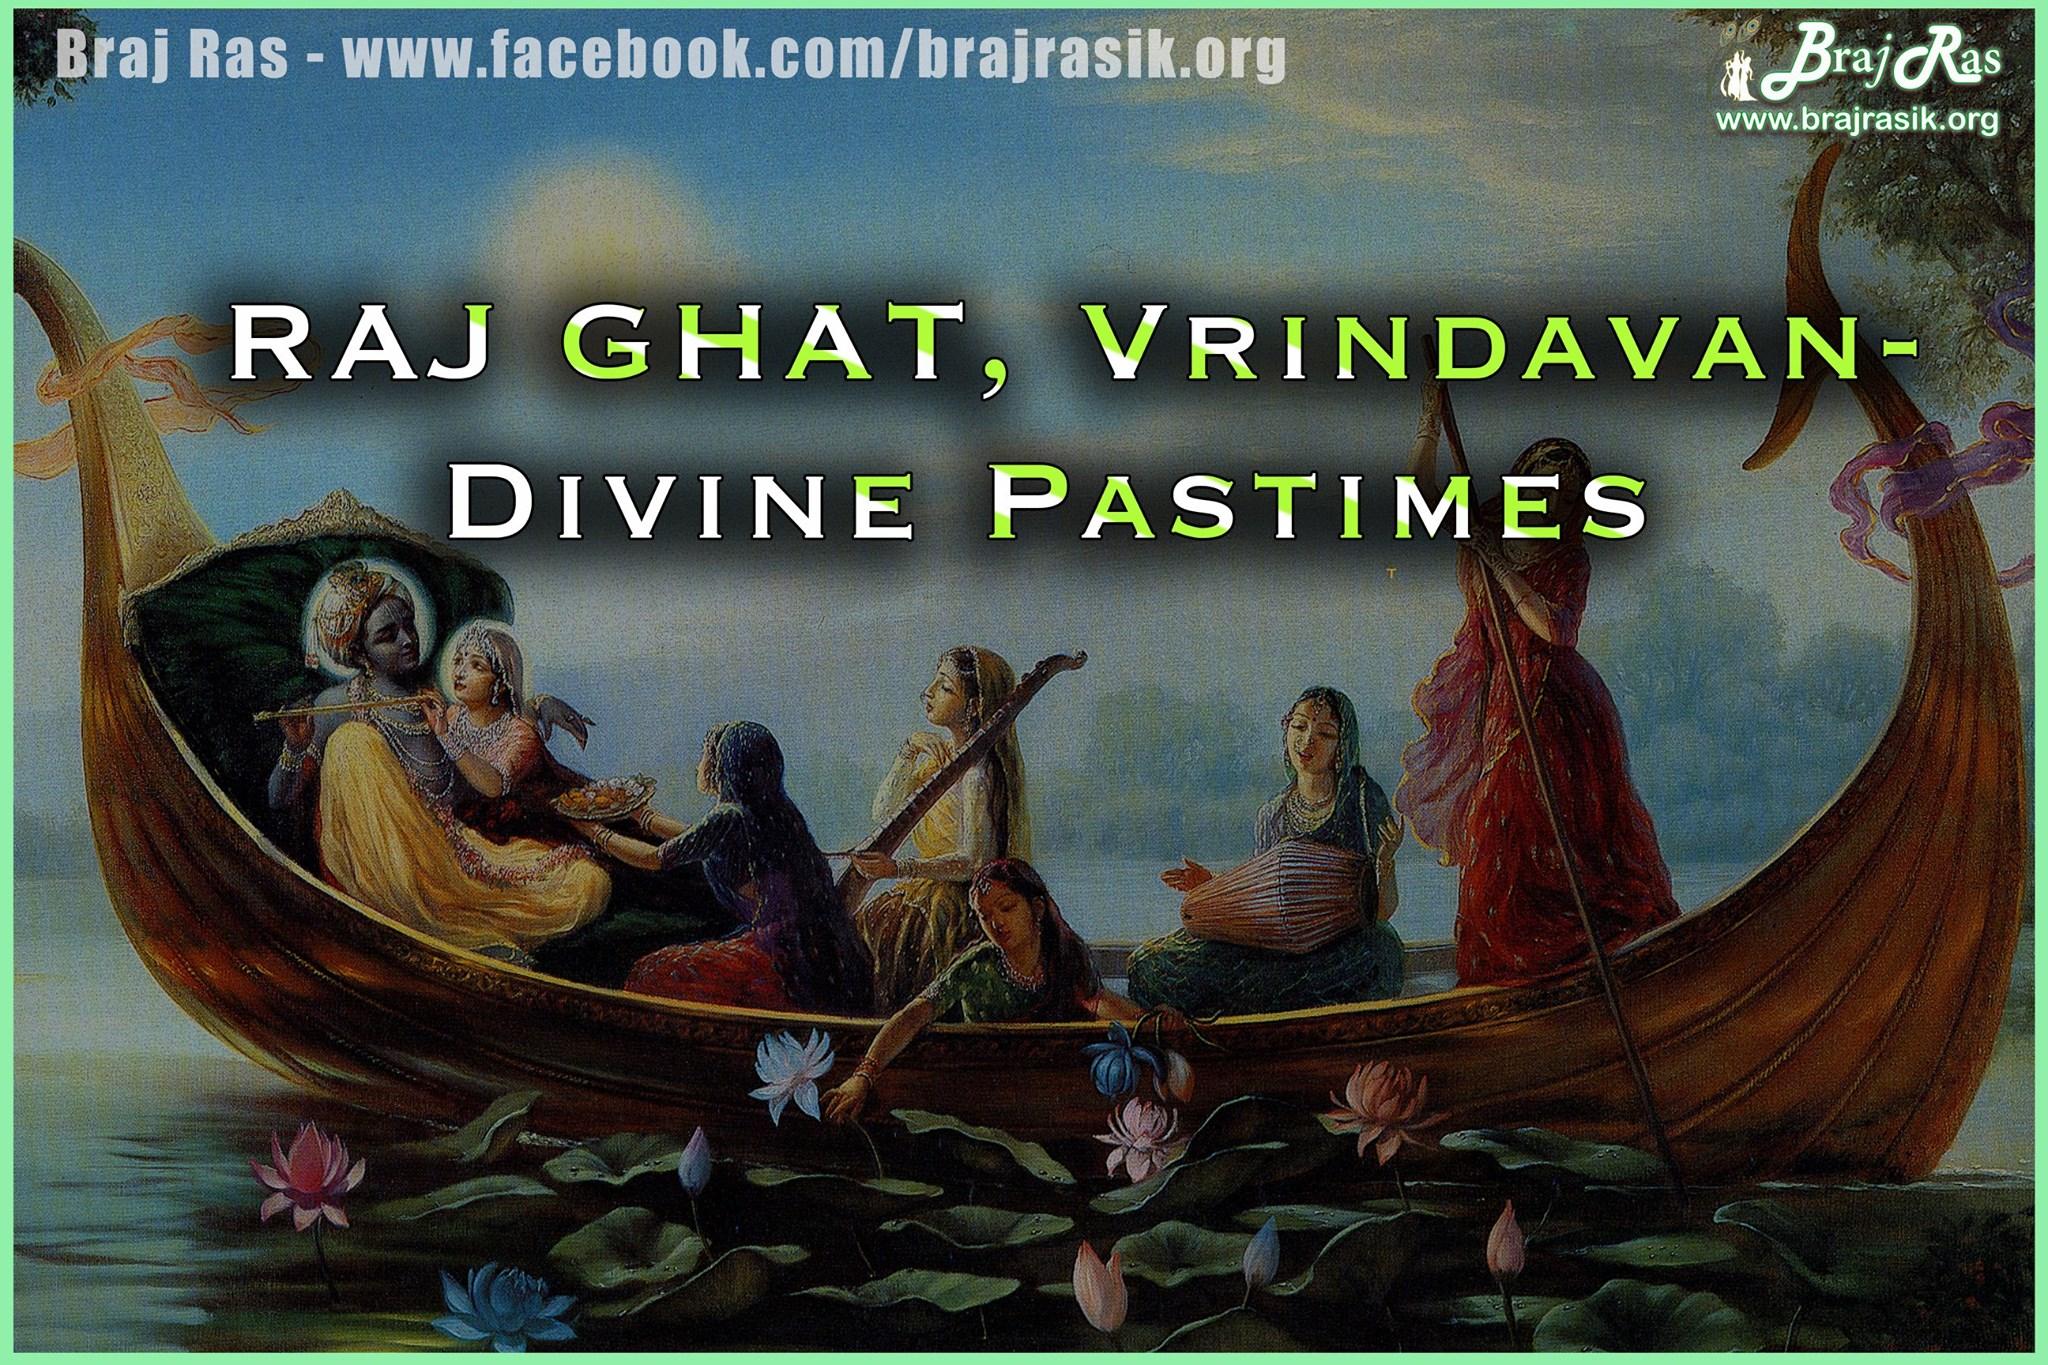 Raj Ghat, Vrindavan - Divine Pastimes